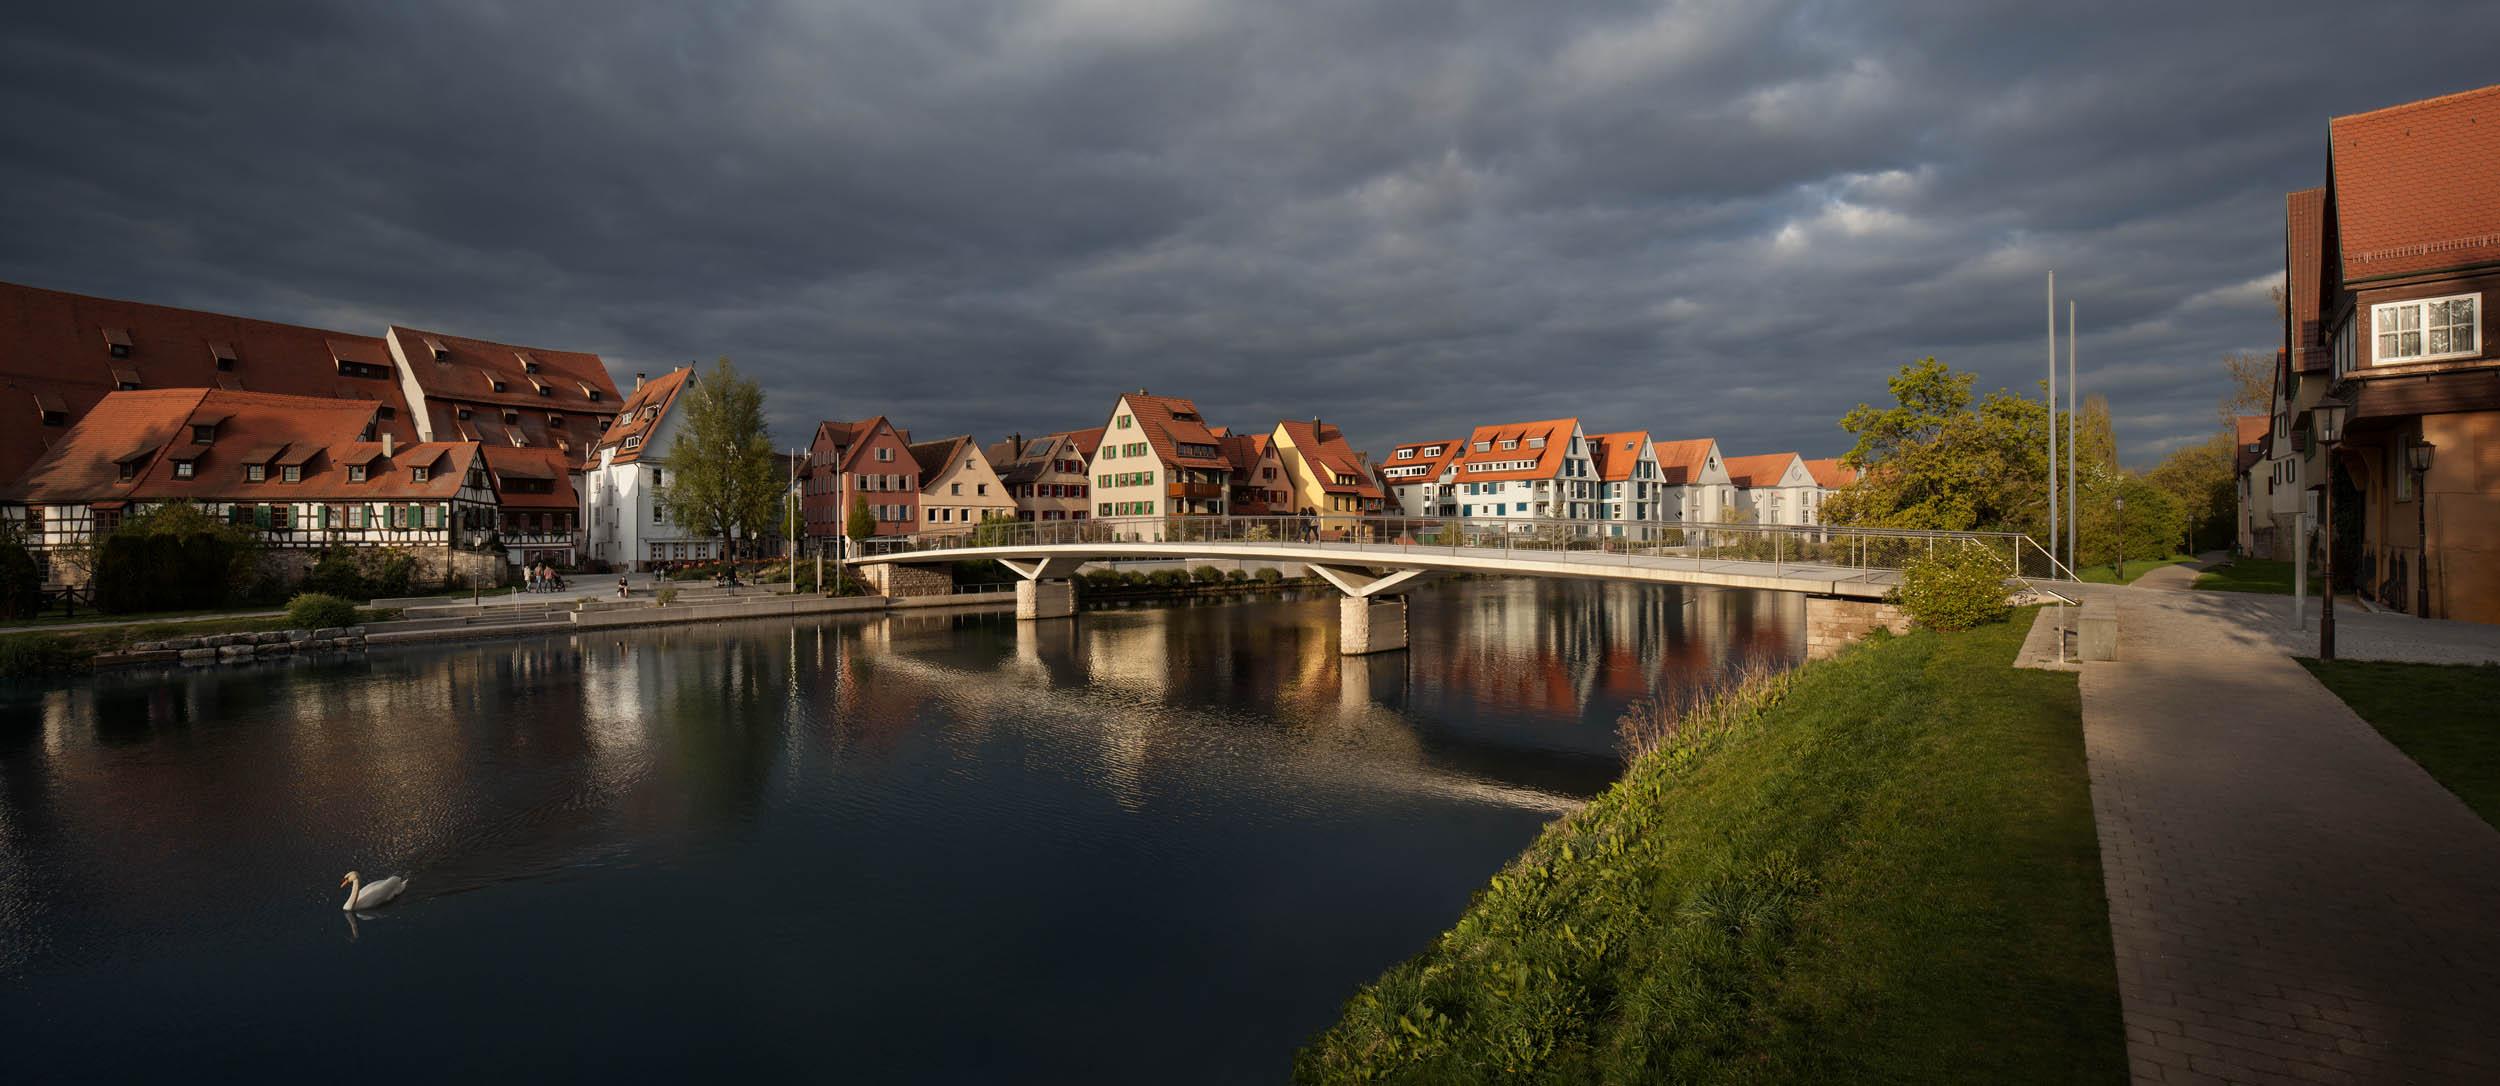 'Josef-Eberle-Brücke' in Rottenburg am Neckar